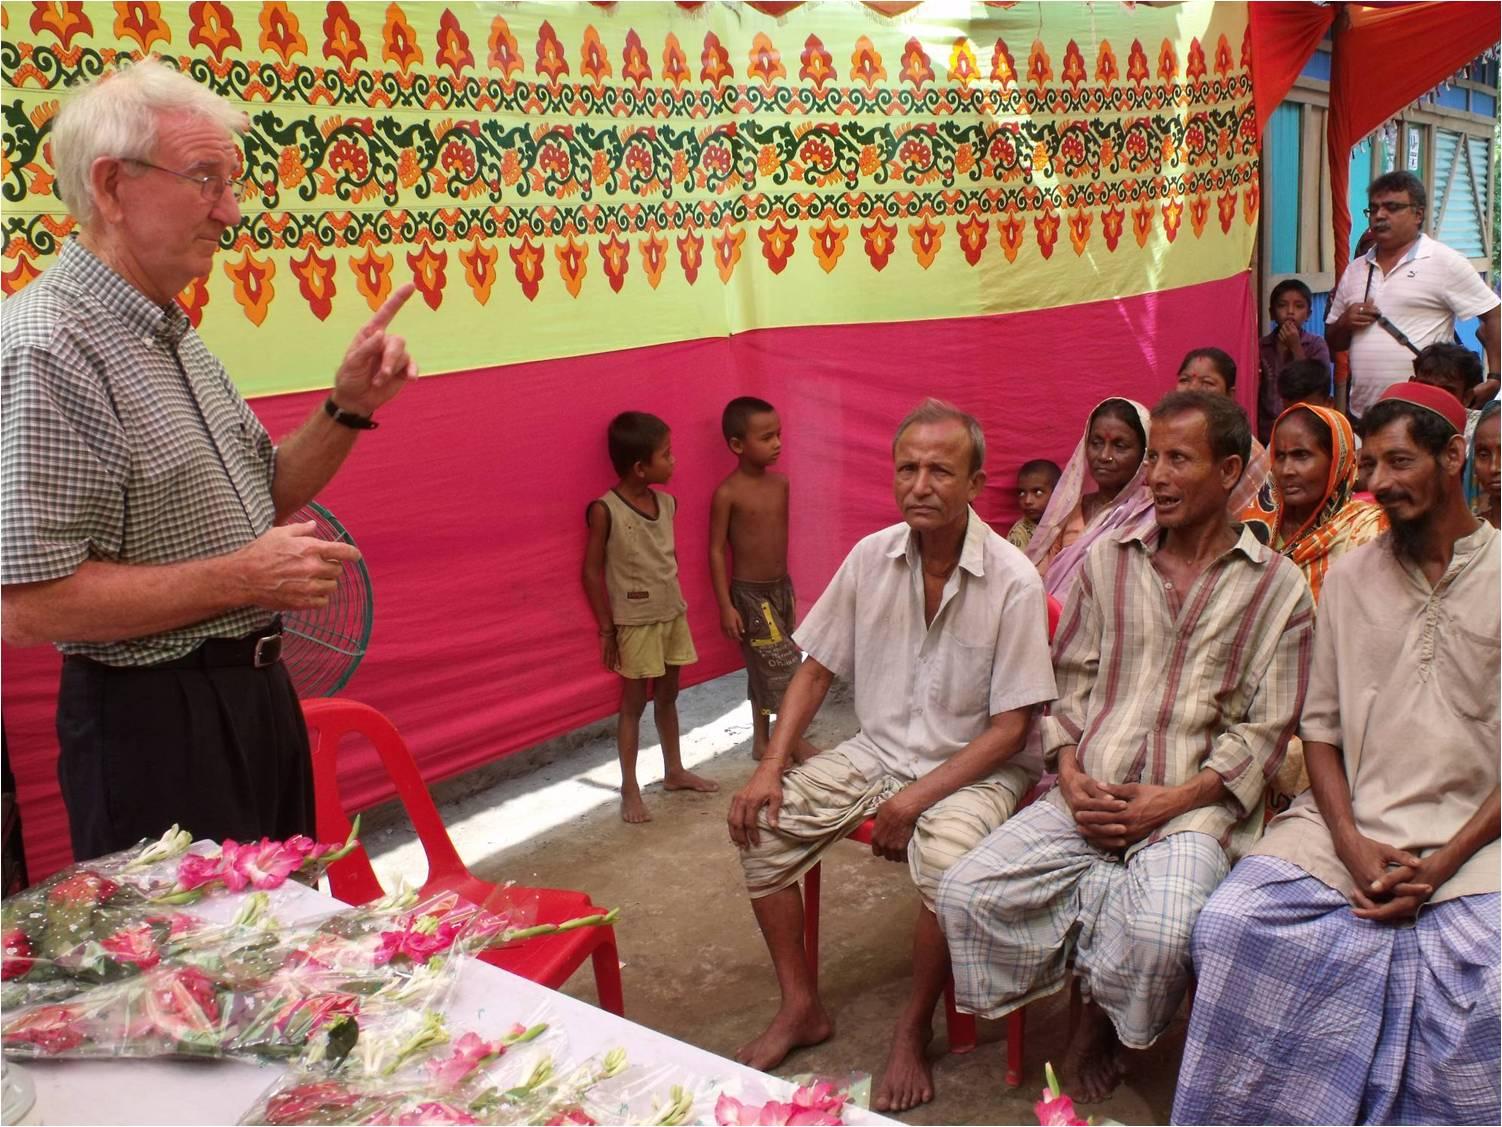 Harold preaching to village people